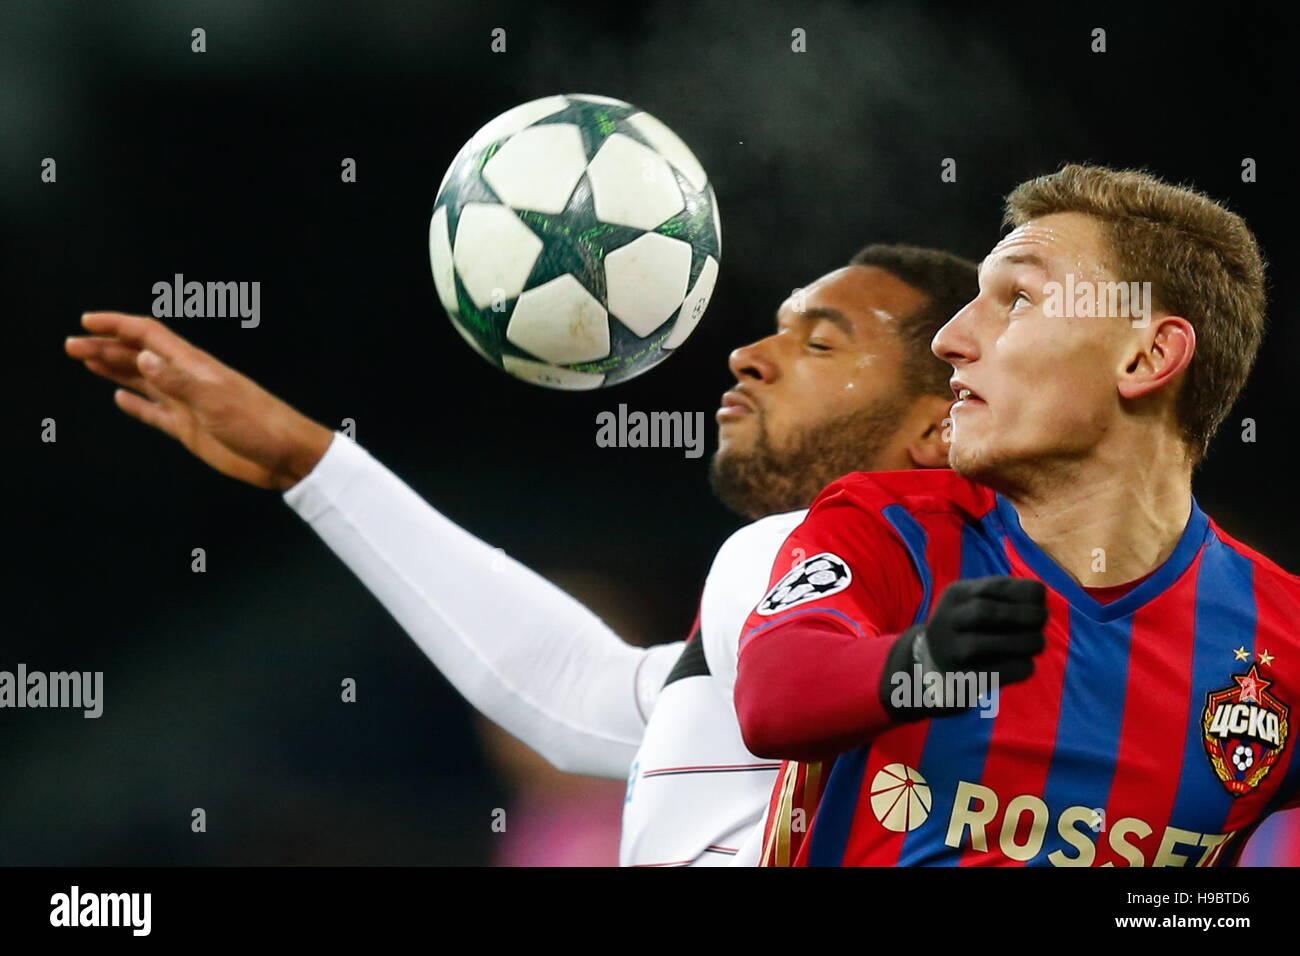 Moskau, Russland. 22. November 2016. Bayer 04 Leverkusen Jonathan Tah (L) und ZSKA Moskau Fedor Chalov in Aktion Stockbild